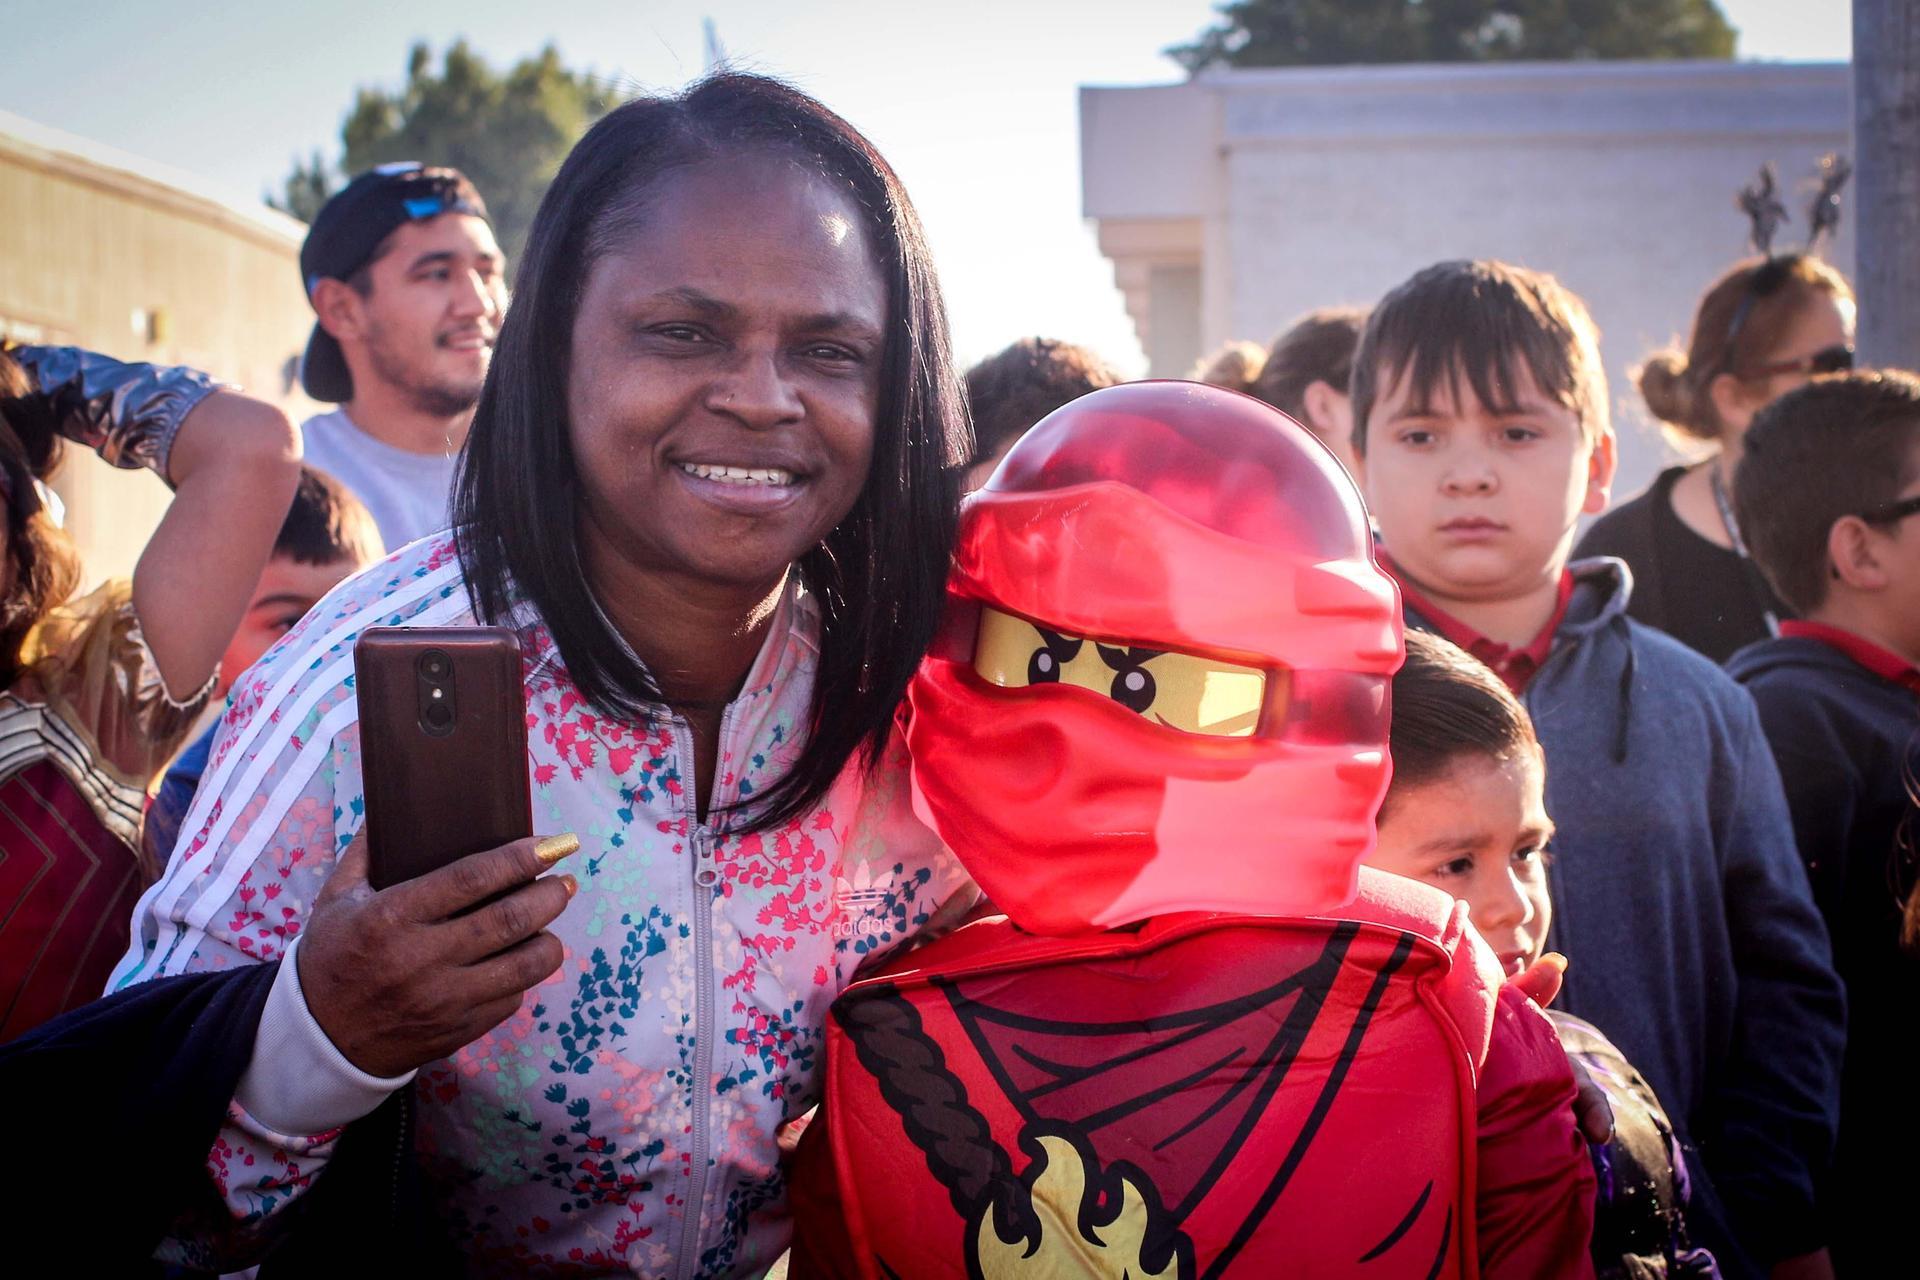 Halloween Parade 2019Halloween Parade 2019